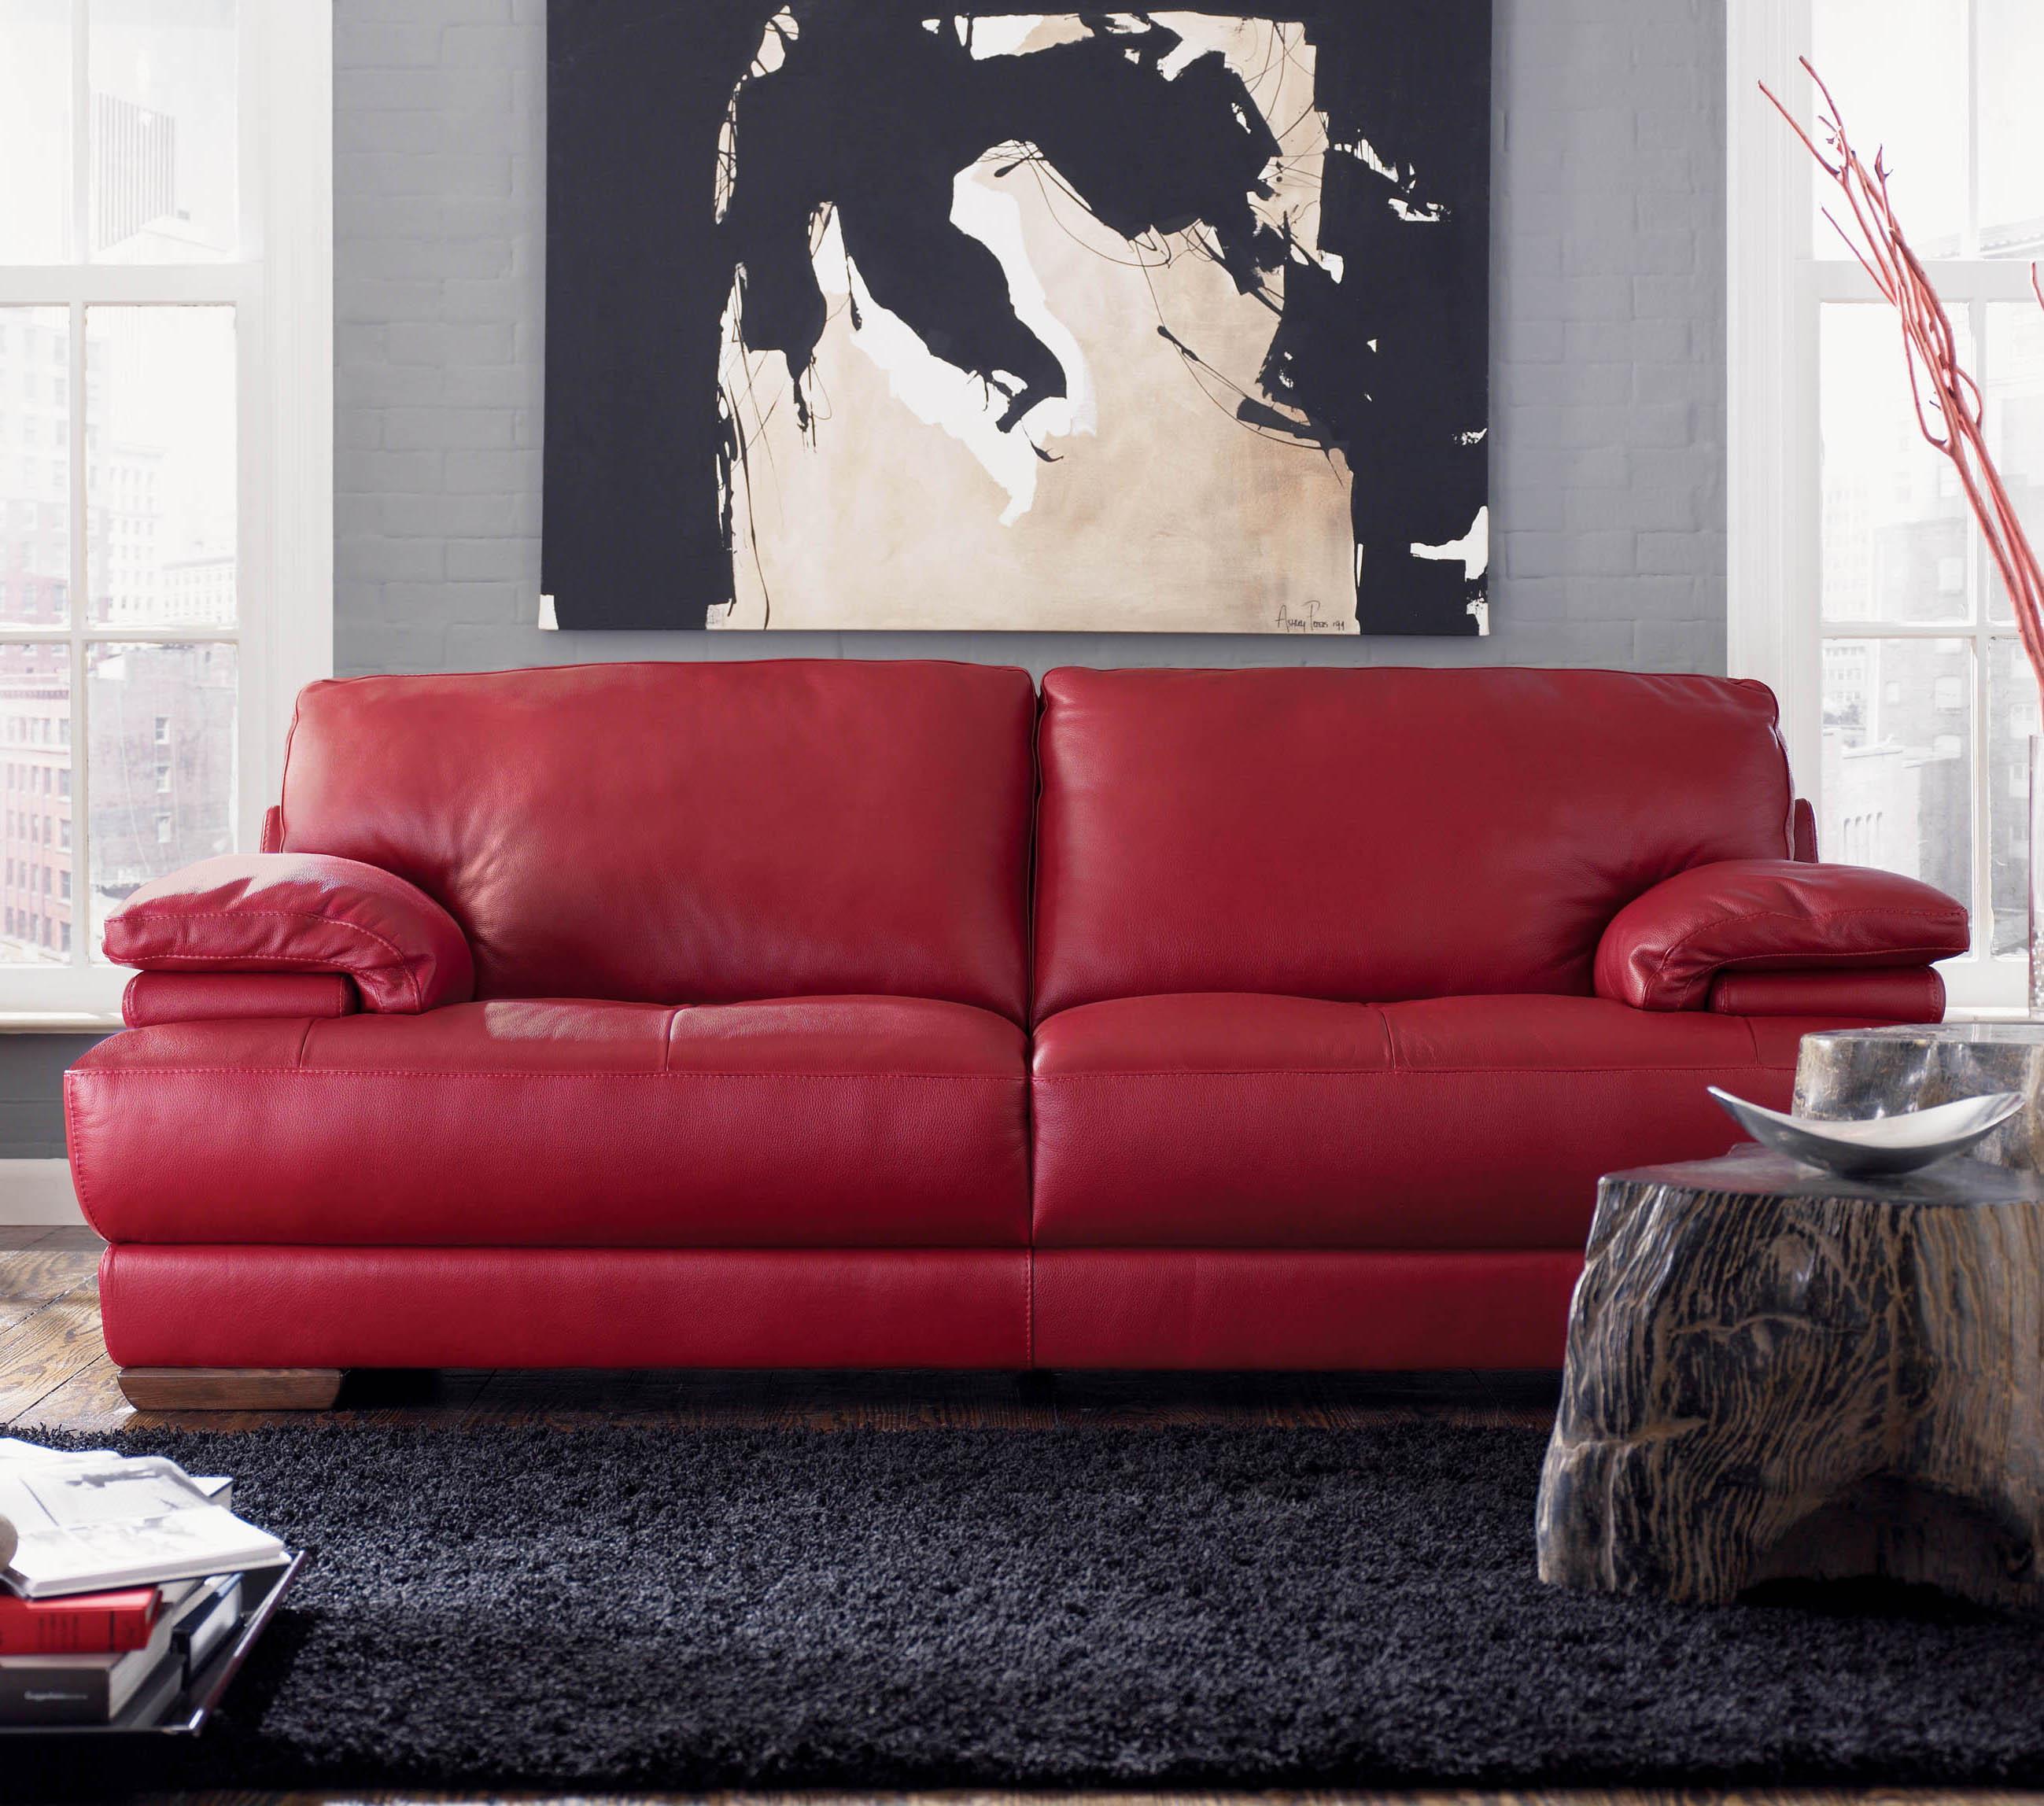 natuzzi red leather sofa and chair reading blackburn sofascore home textiles